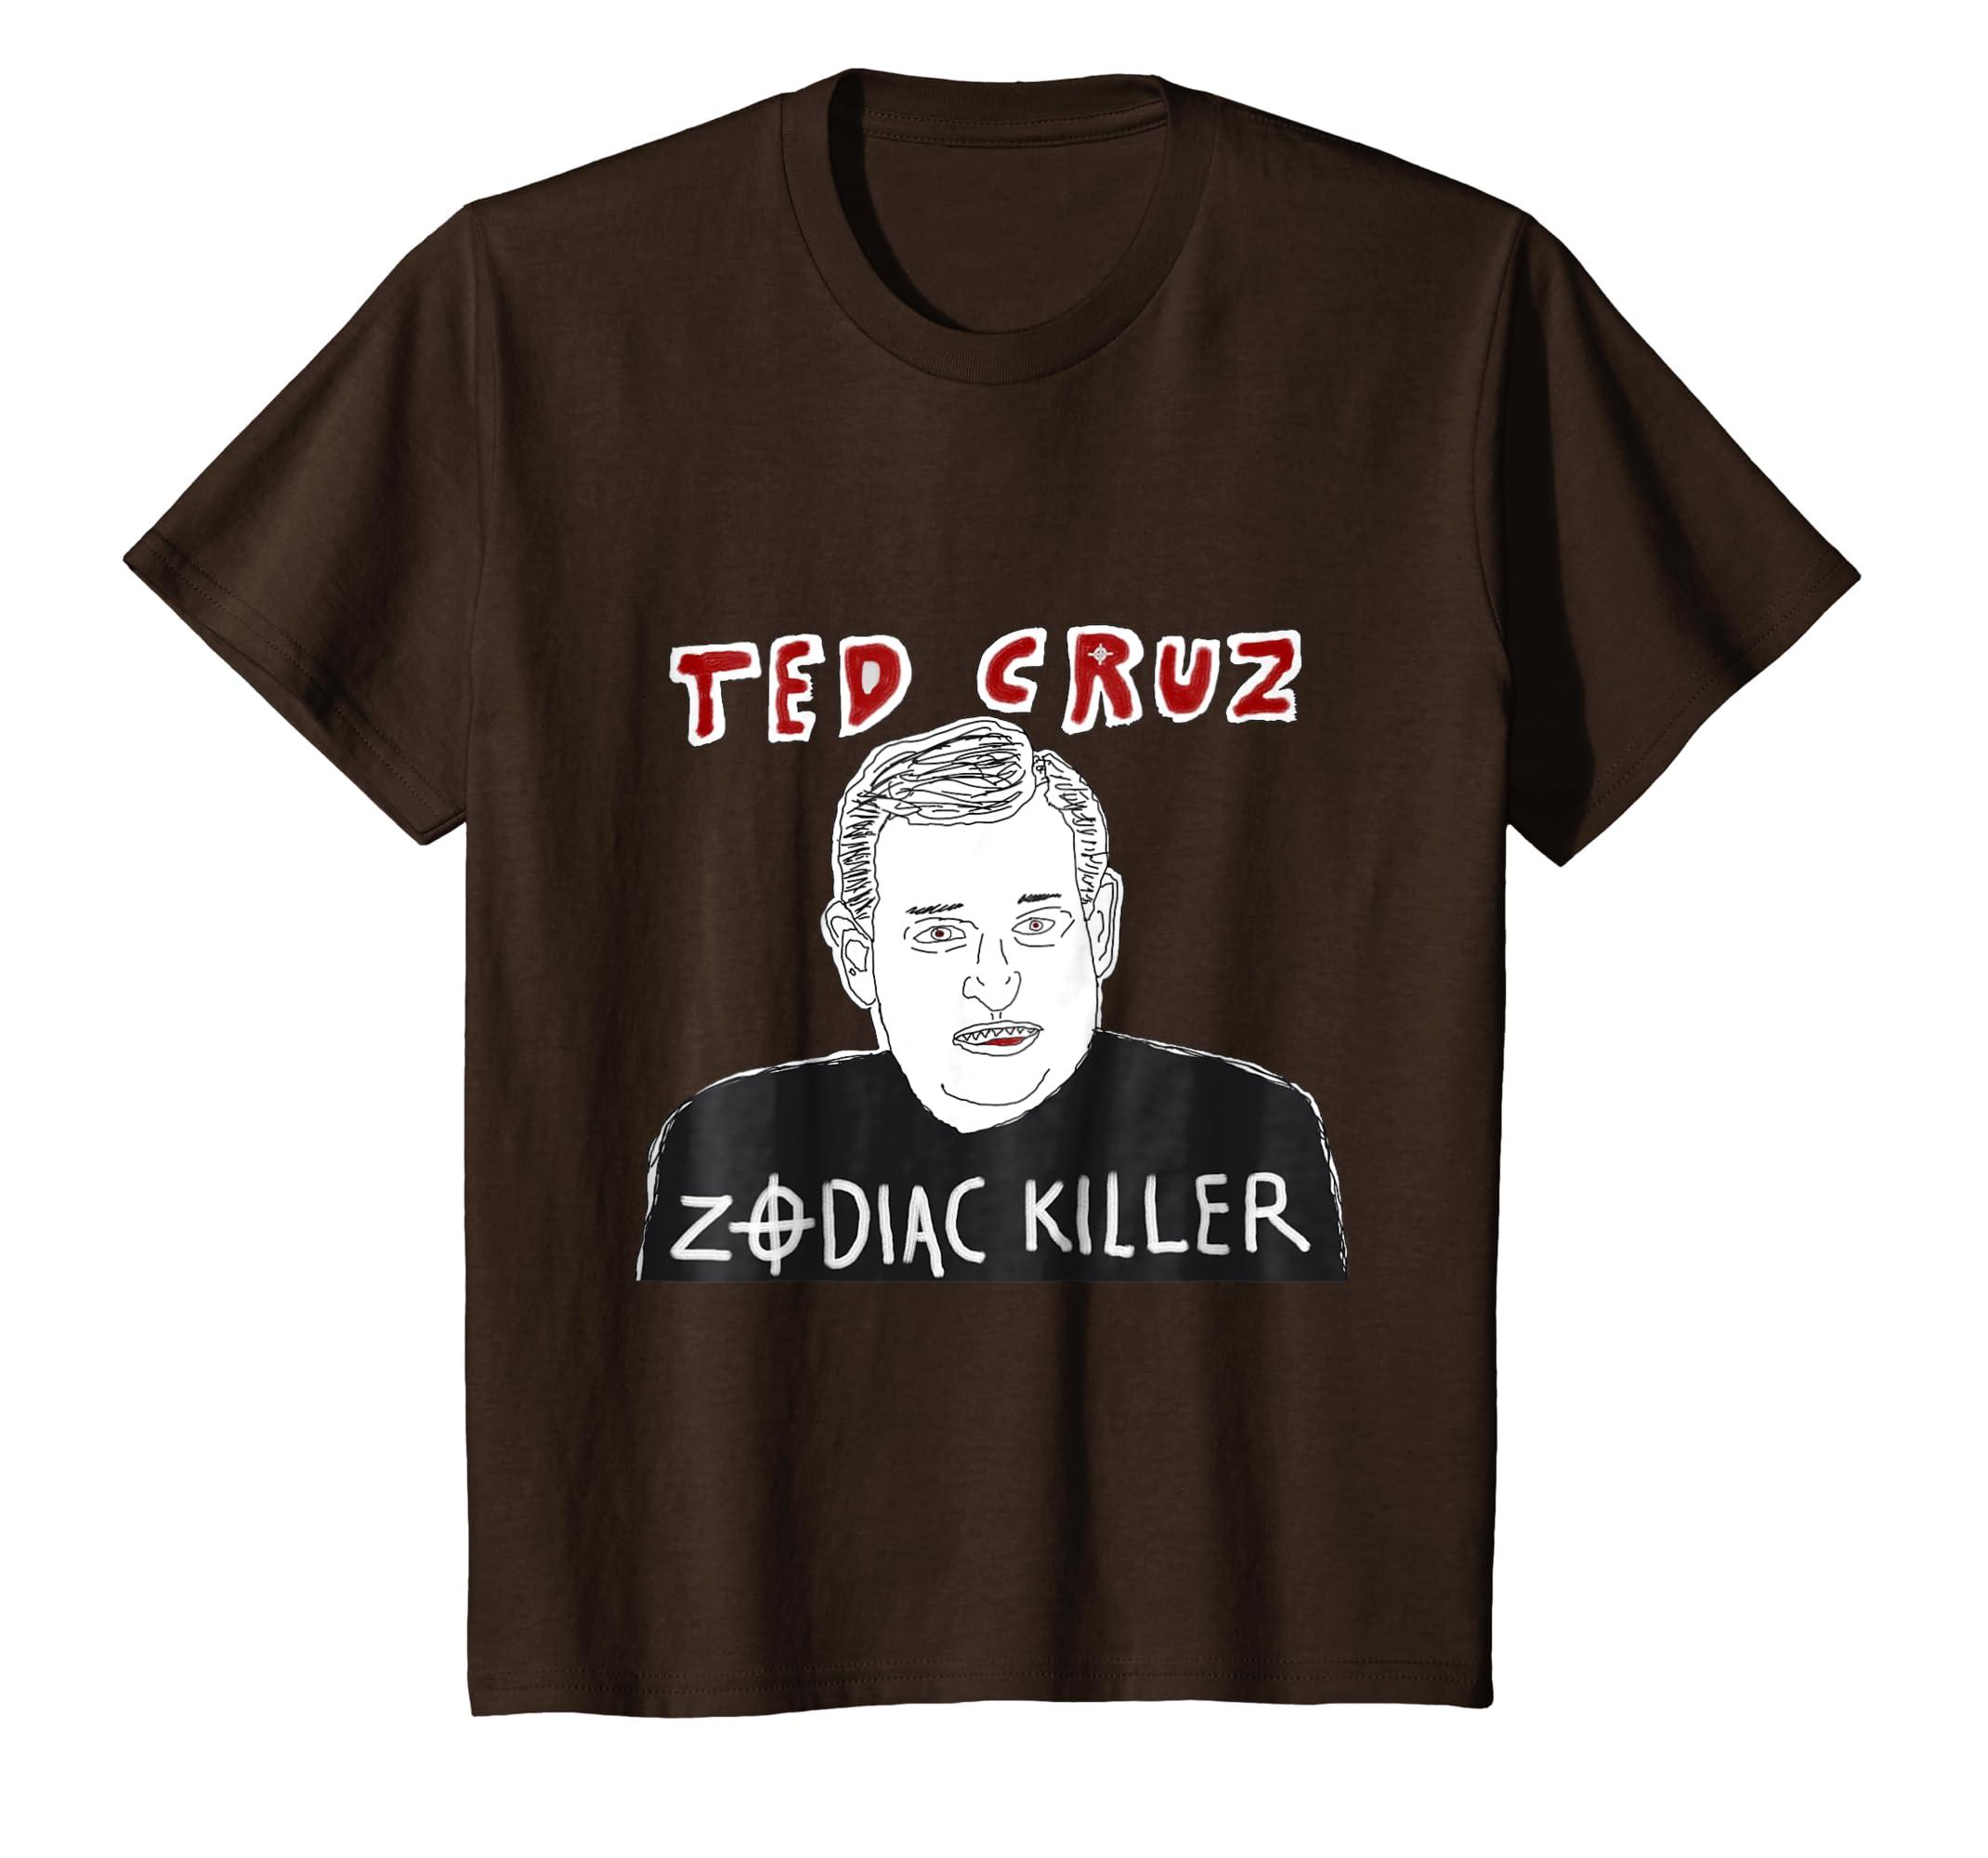 ba9872a173 Amazon.com: Ted Cruz Zodiac Killer T-Shirt Funny Conspiracy Theory Shirt:  Clothing